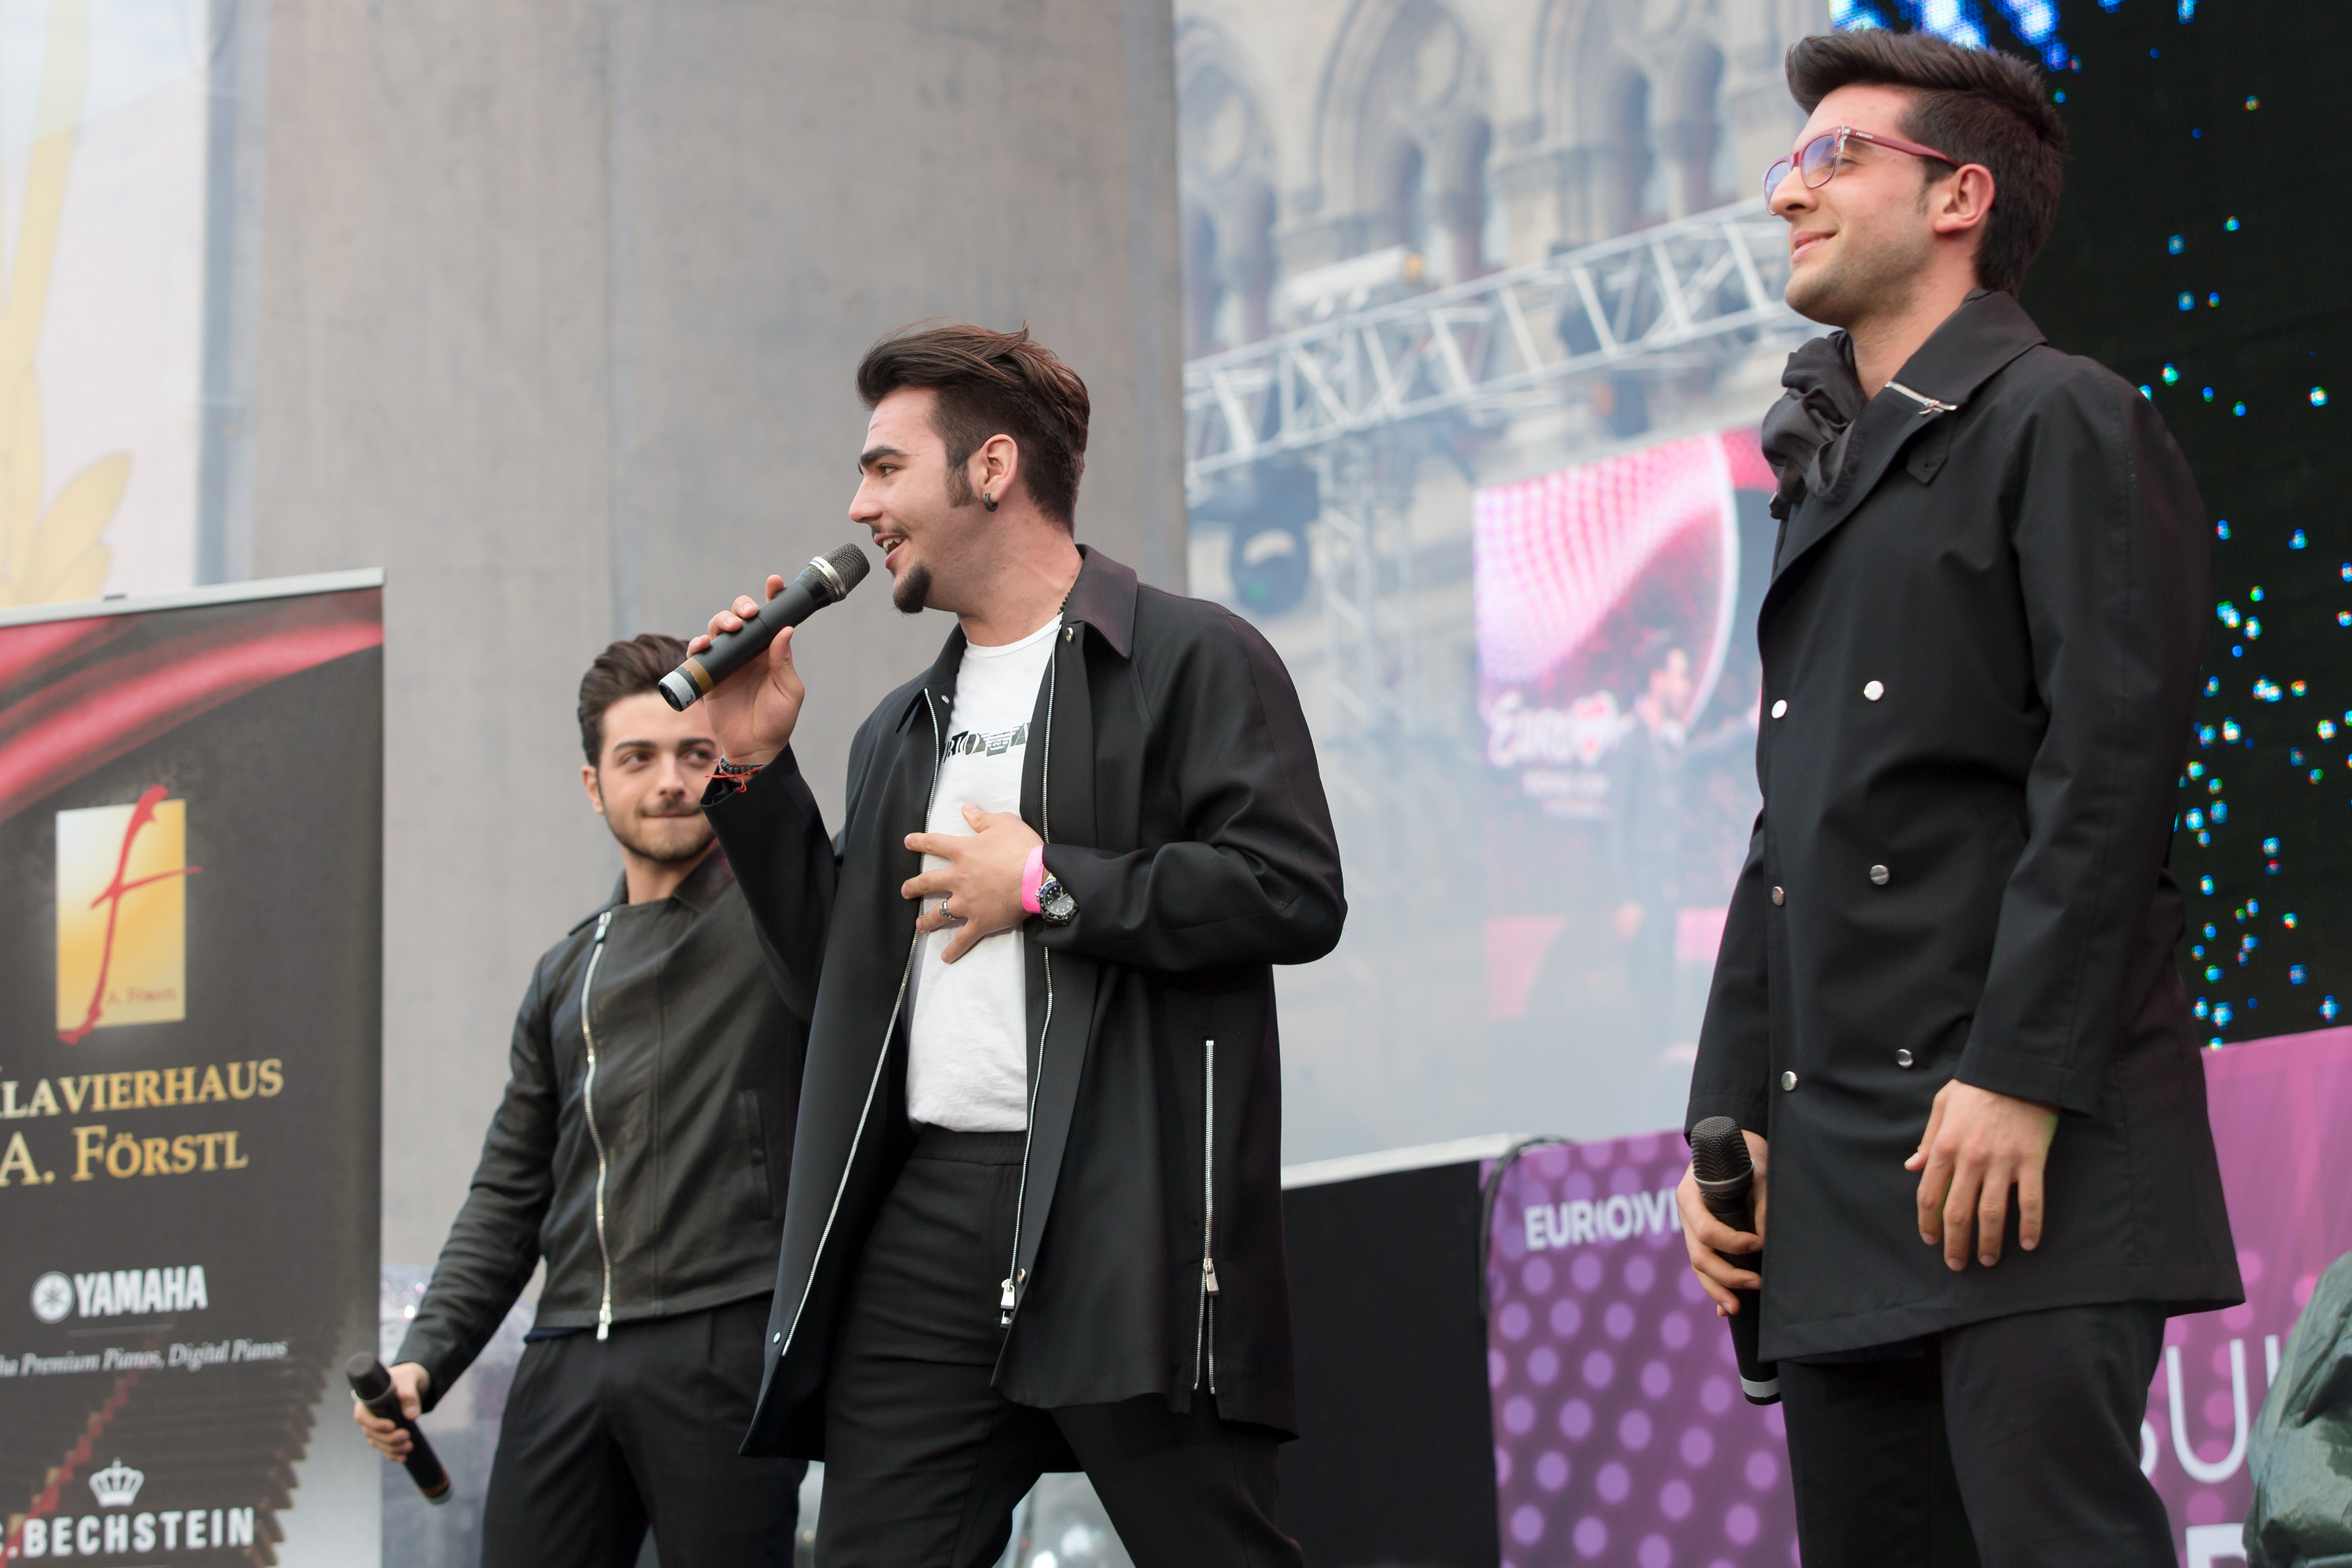 Eurovision 2020 winner predictions, bet on eurovision, esc 2020 bets